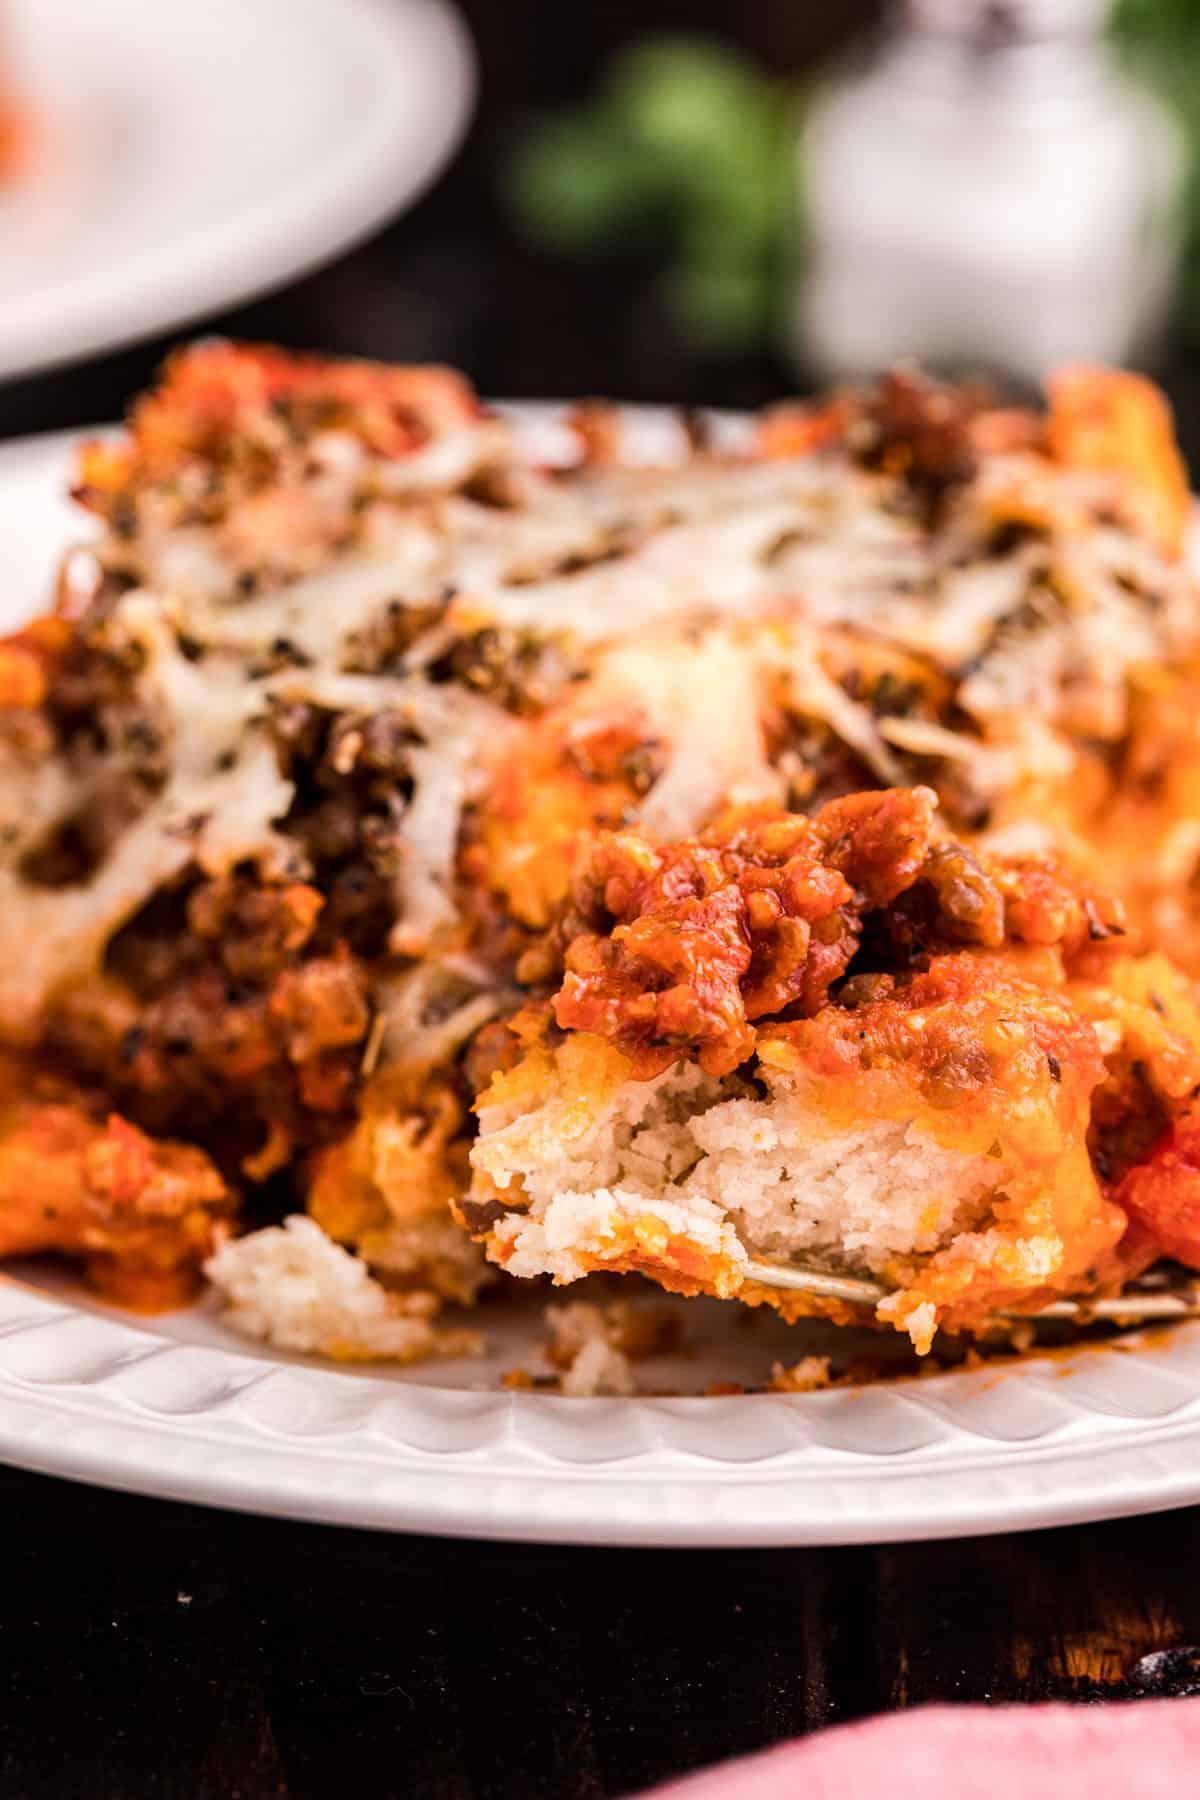 Pizza casserole close up on a plate.